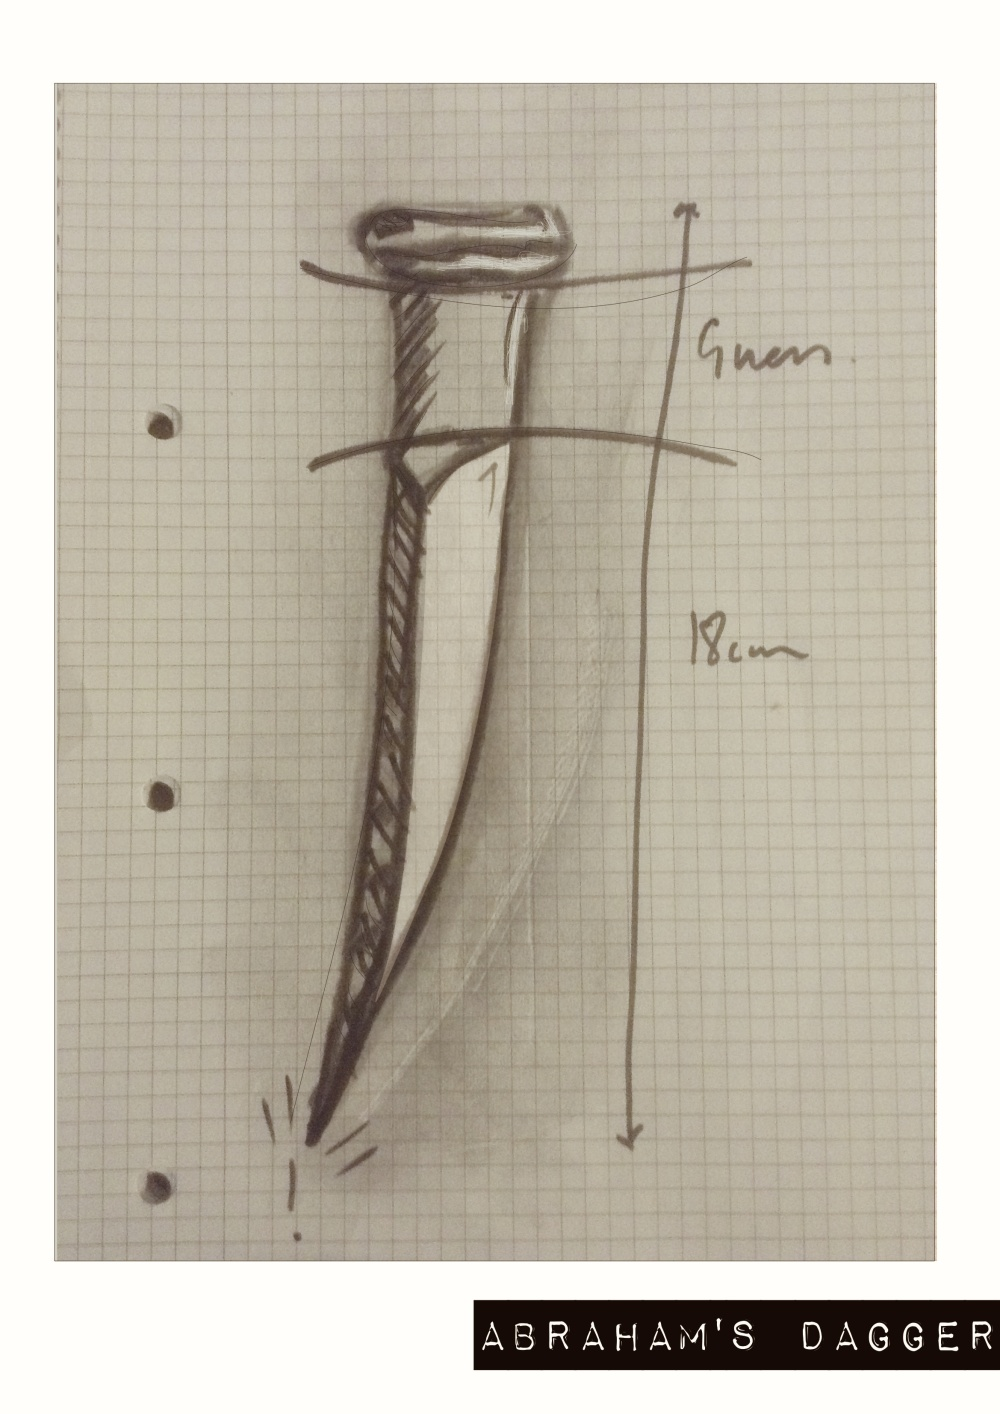 abrahams dagger